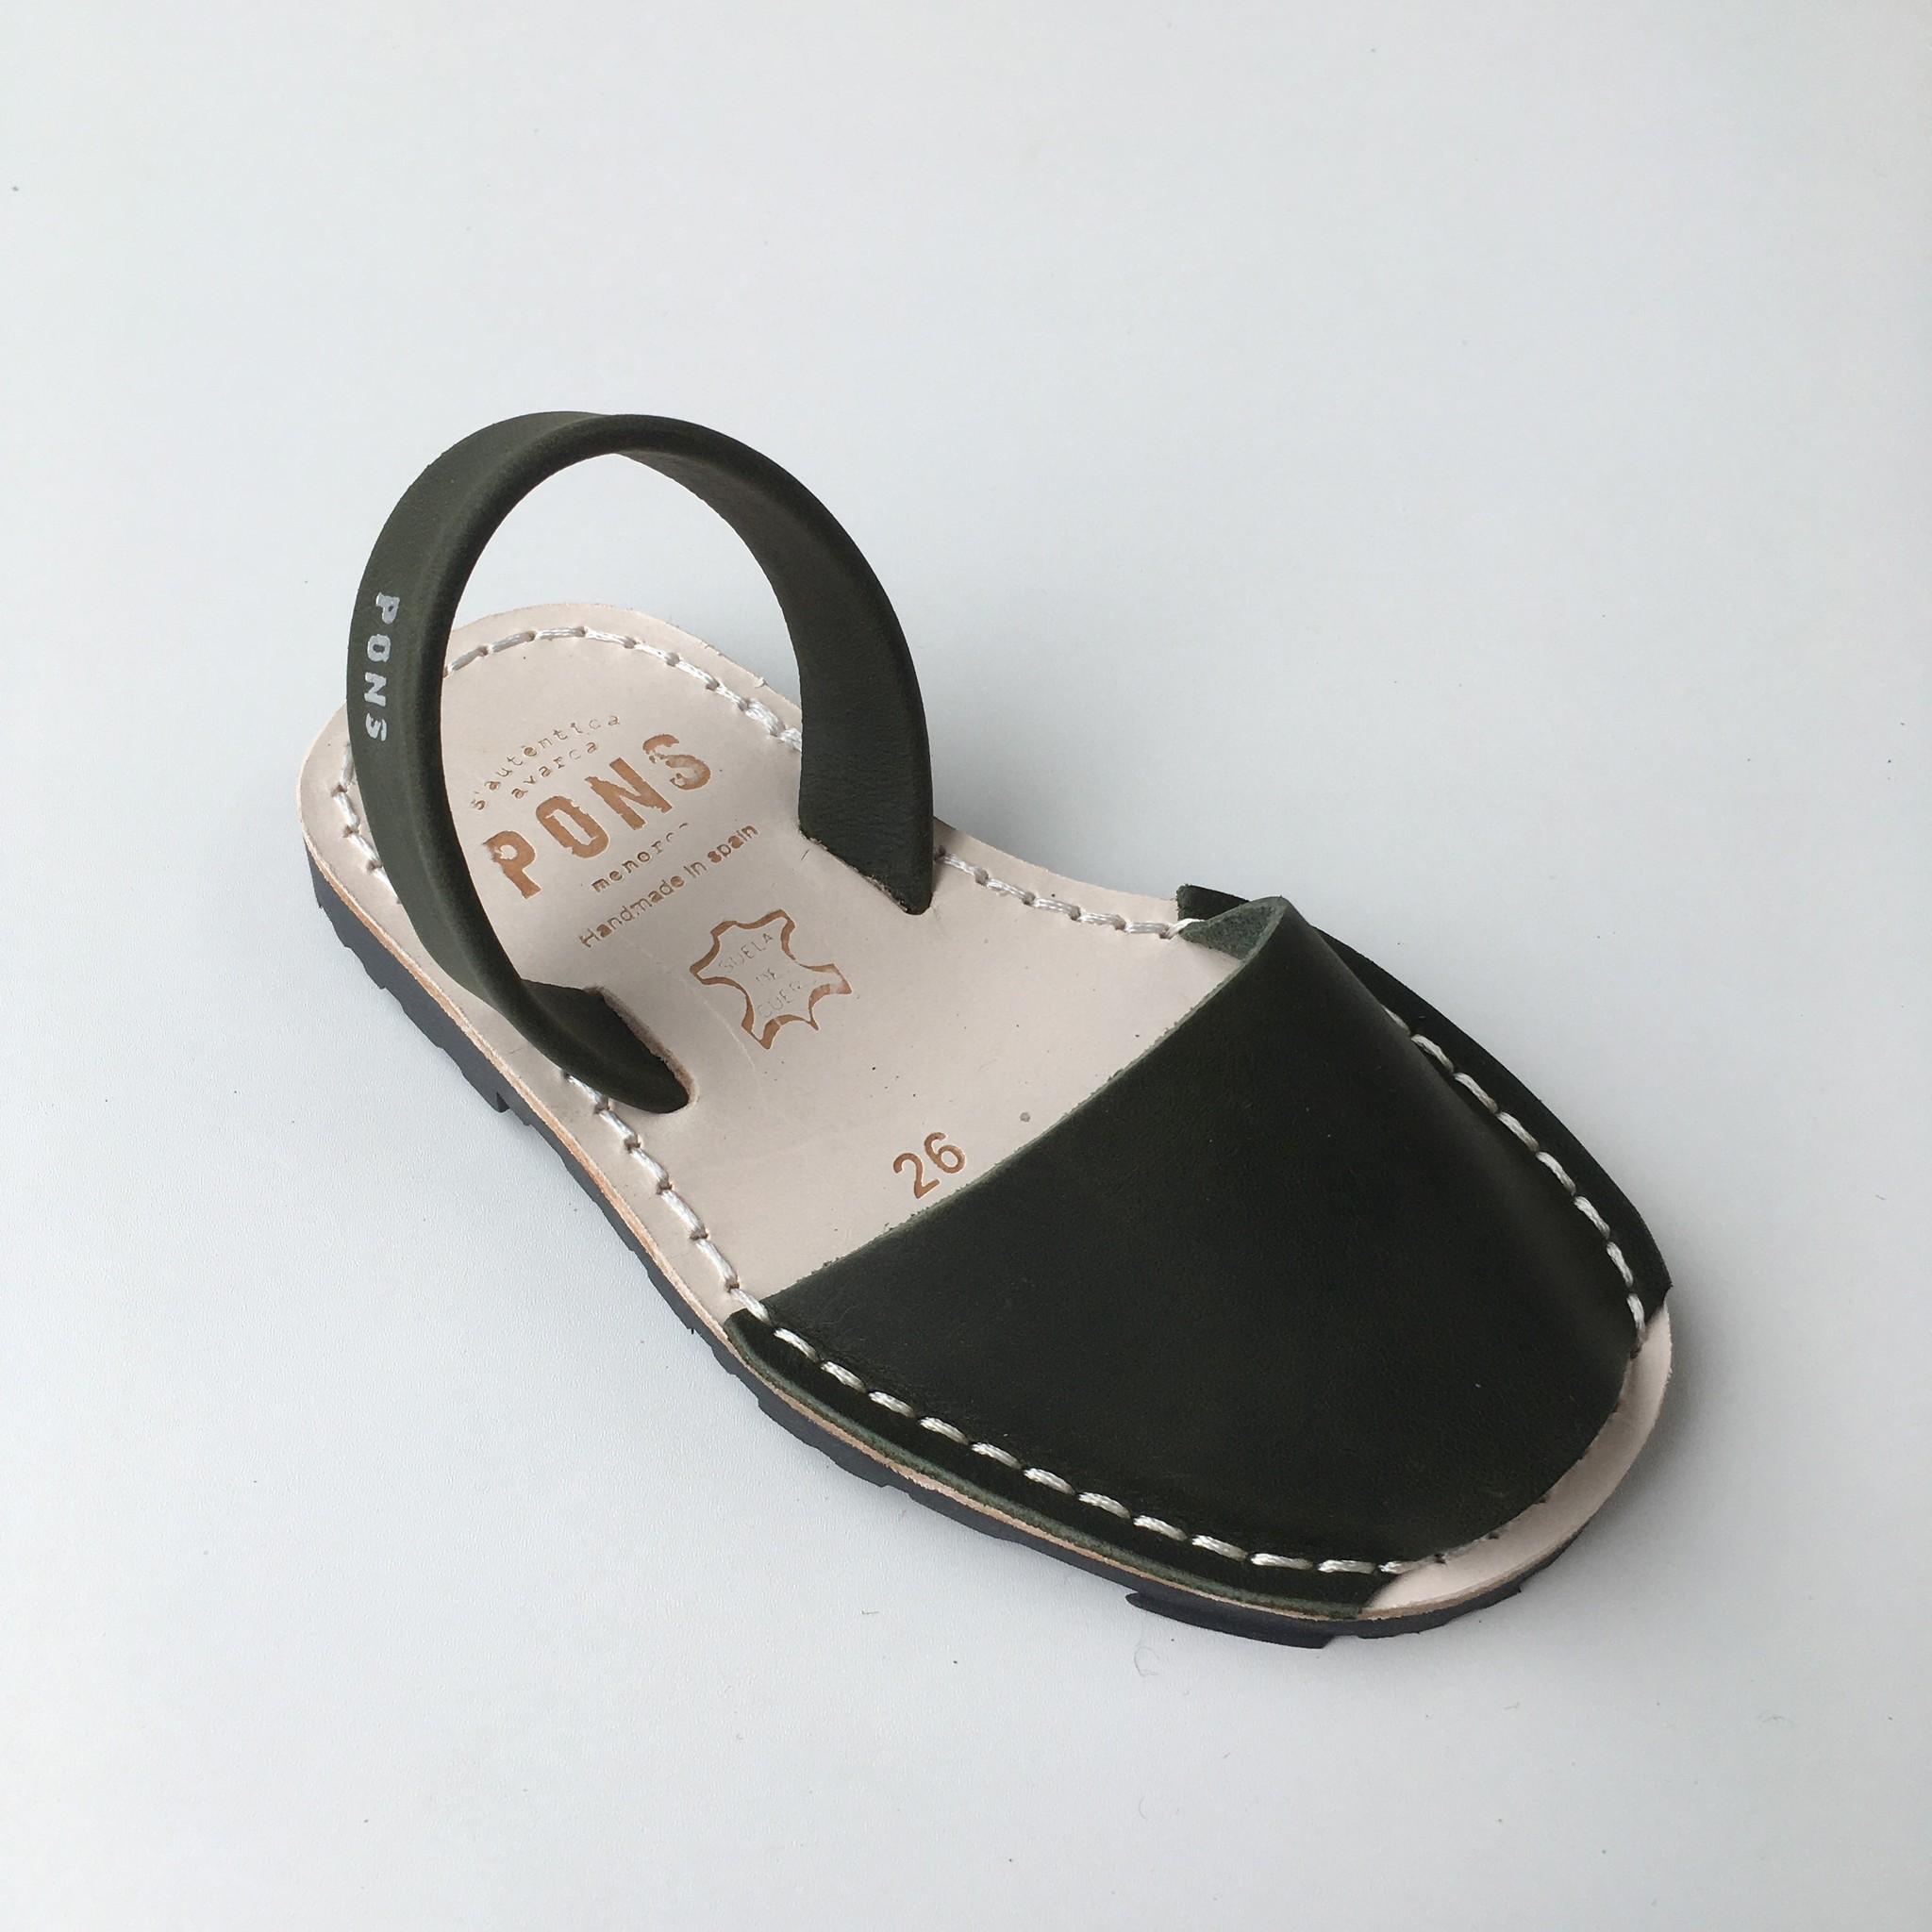 Pons  leren avarca sandaal kind DUNA - dennen groen - 26 tm 34